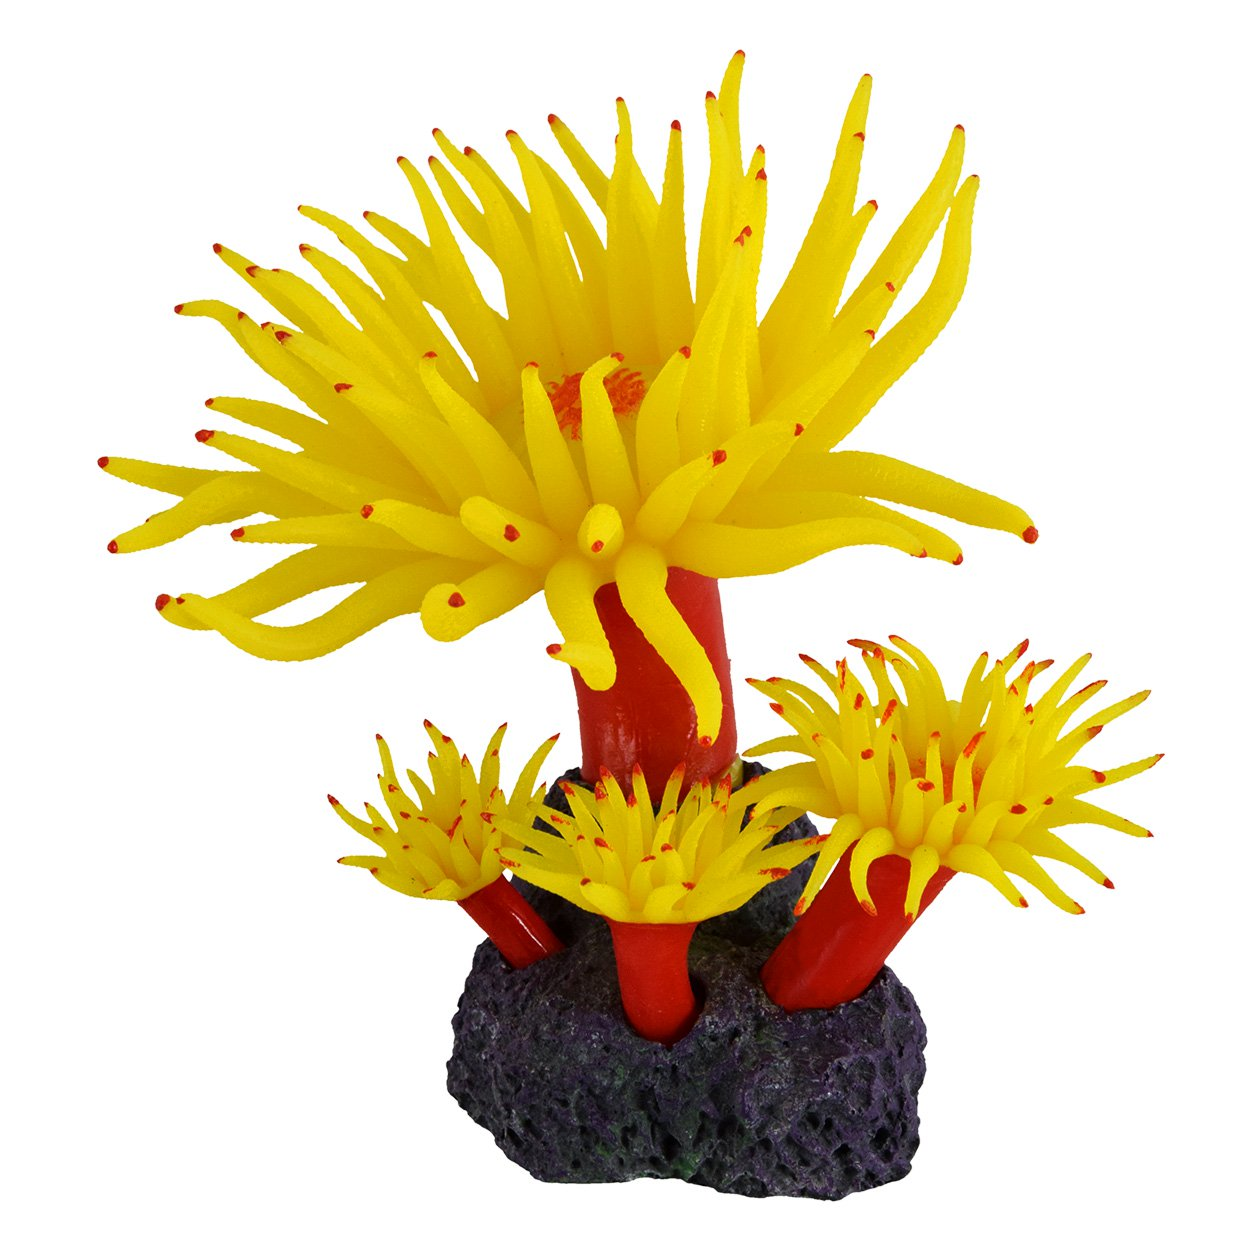 Underwater Treasures Duncan Coral - Sunset